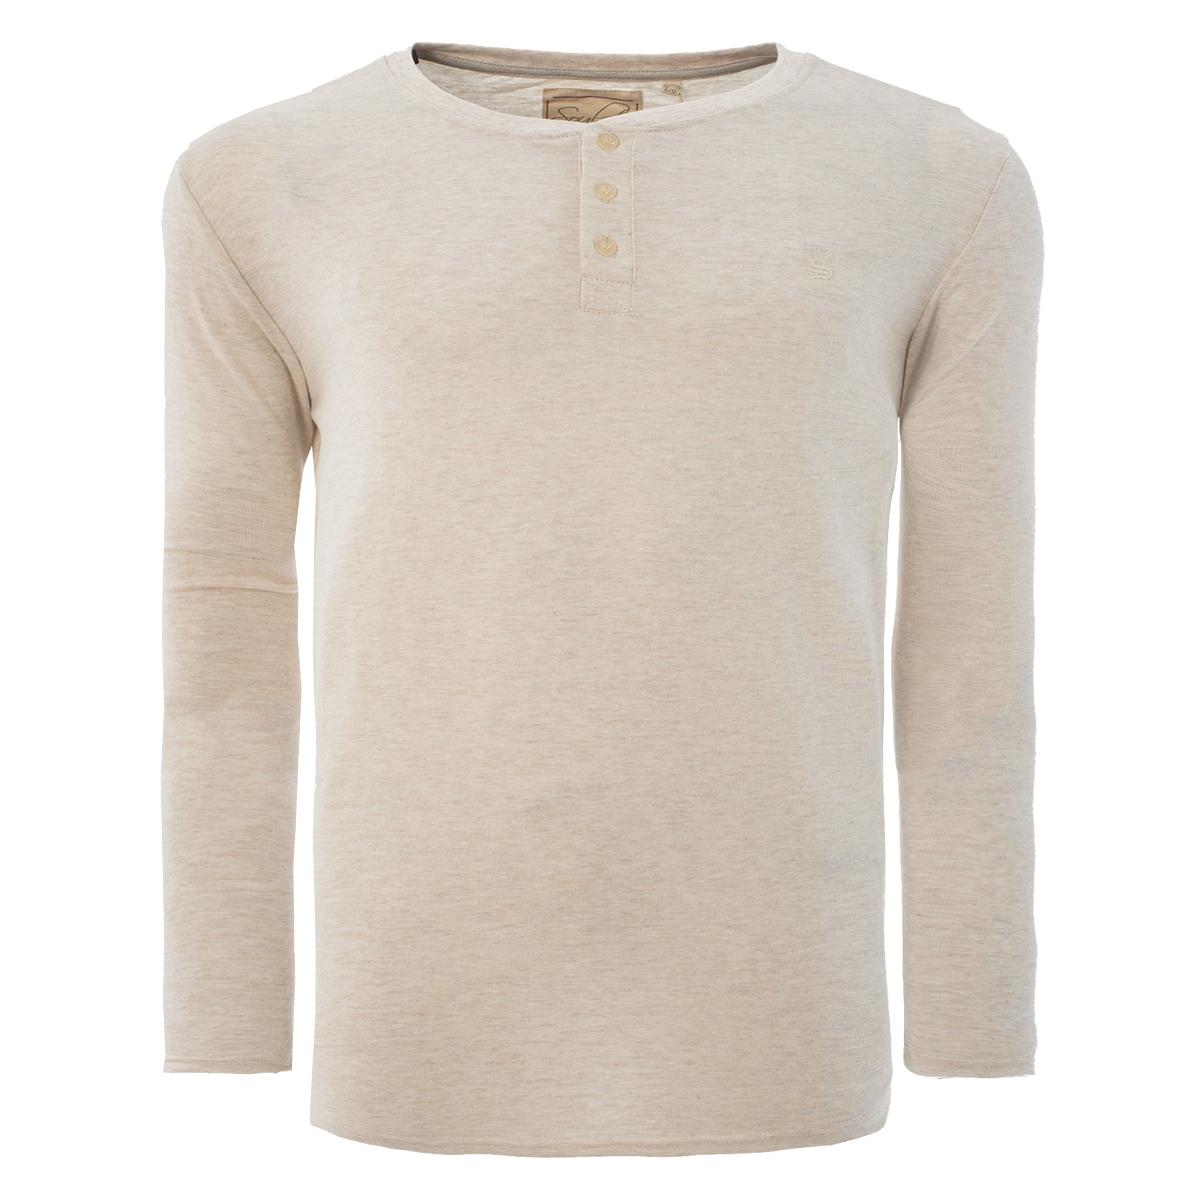 Men-Grandad-T-Shirt-Long-Sleeve-Jersey-Ribbed-Top-Cotton-Rich-Brave-Soul thumbnail 58